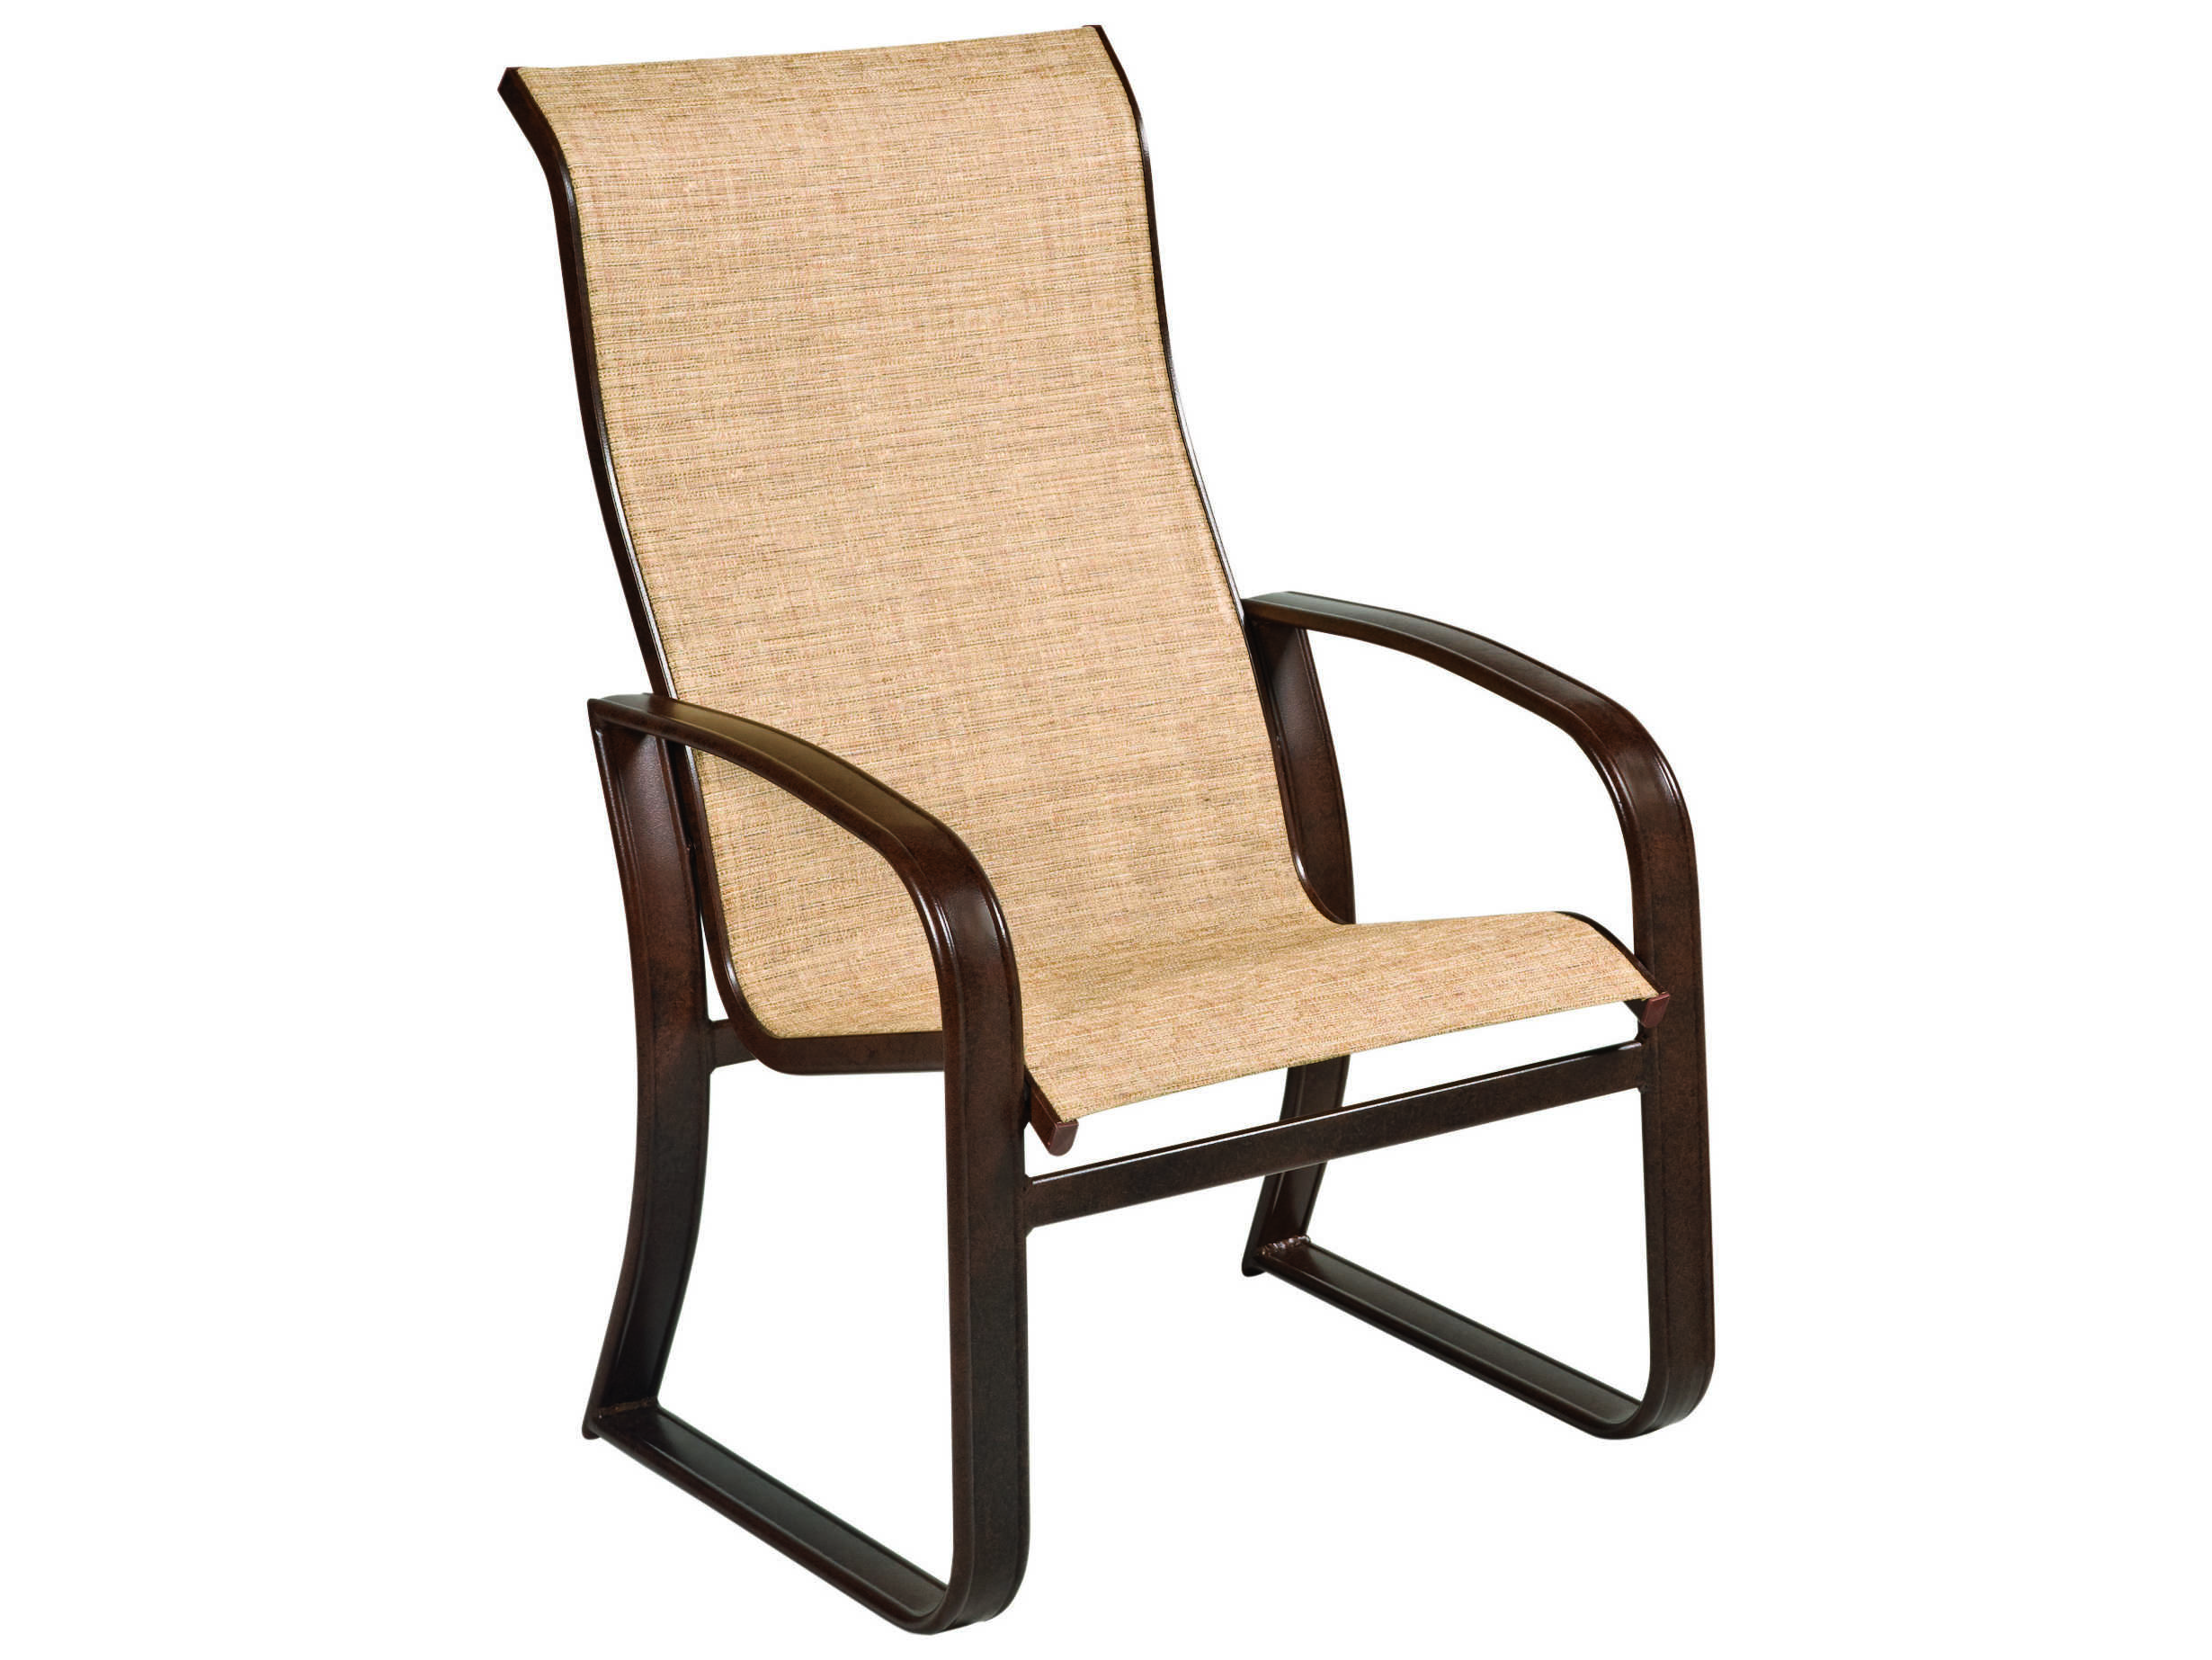 Woodard Cayman Isle Sling Aluminum High Back Dining Arm Chair Wr2fh426